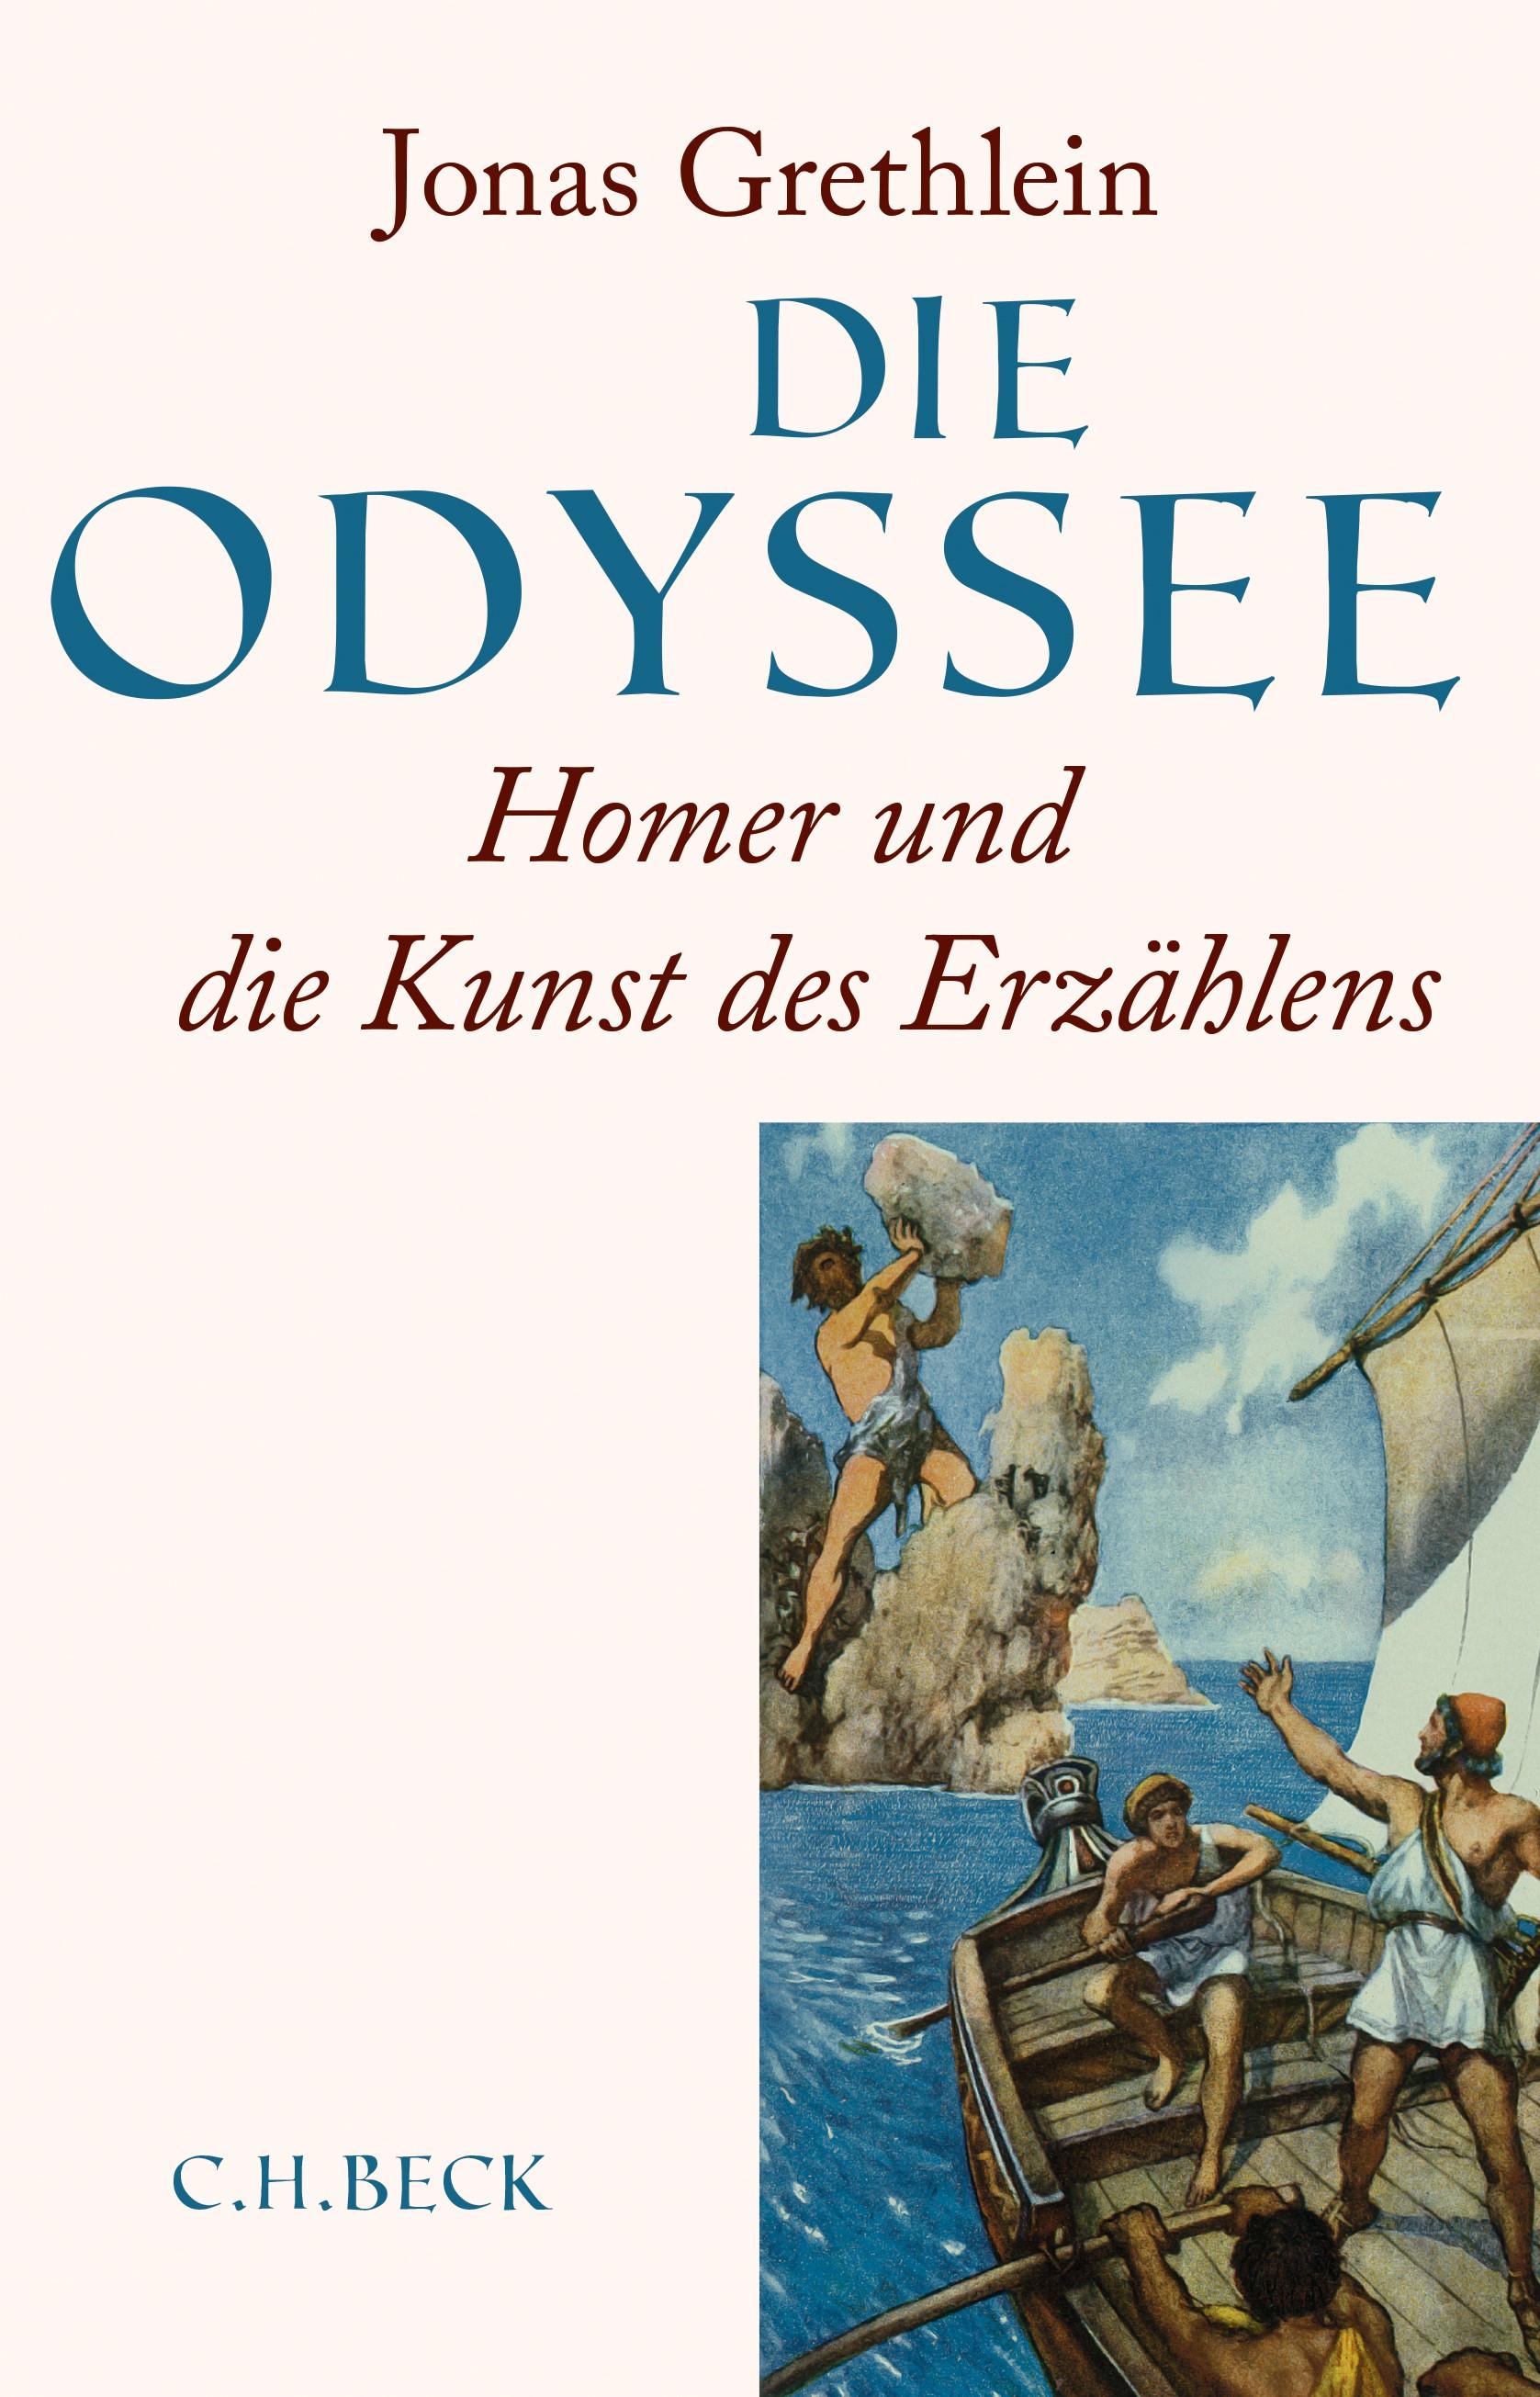 Die Odyssee | Grethlein, Jonas, 2017 | Buch (Cover)